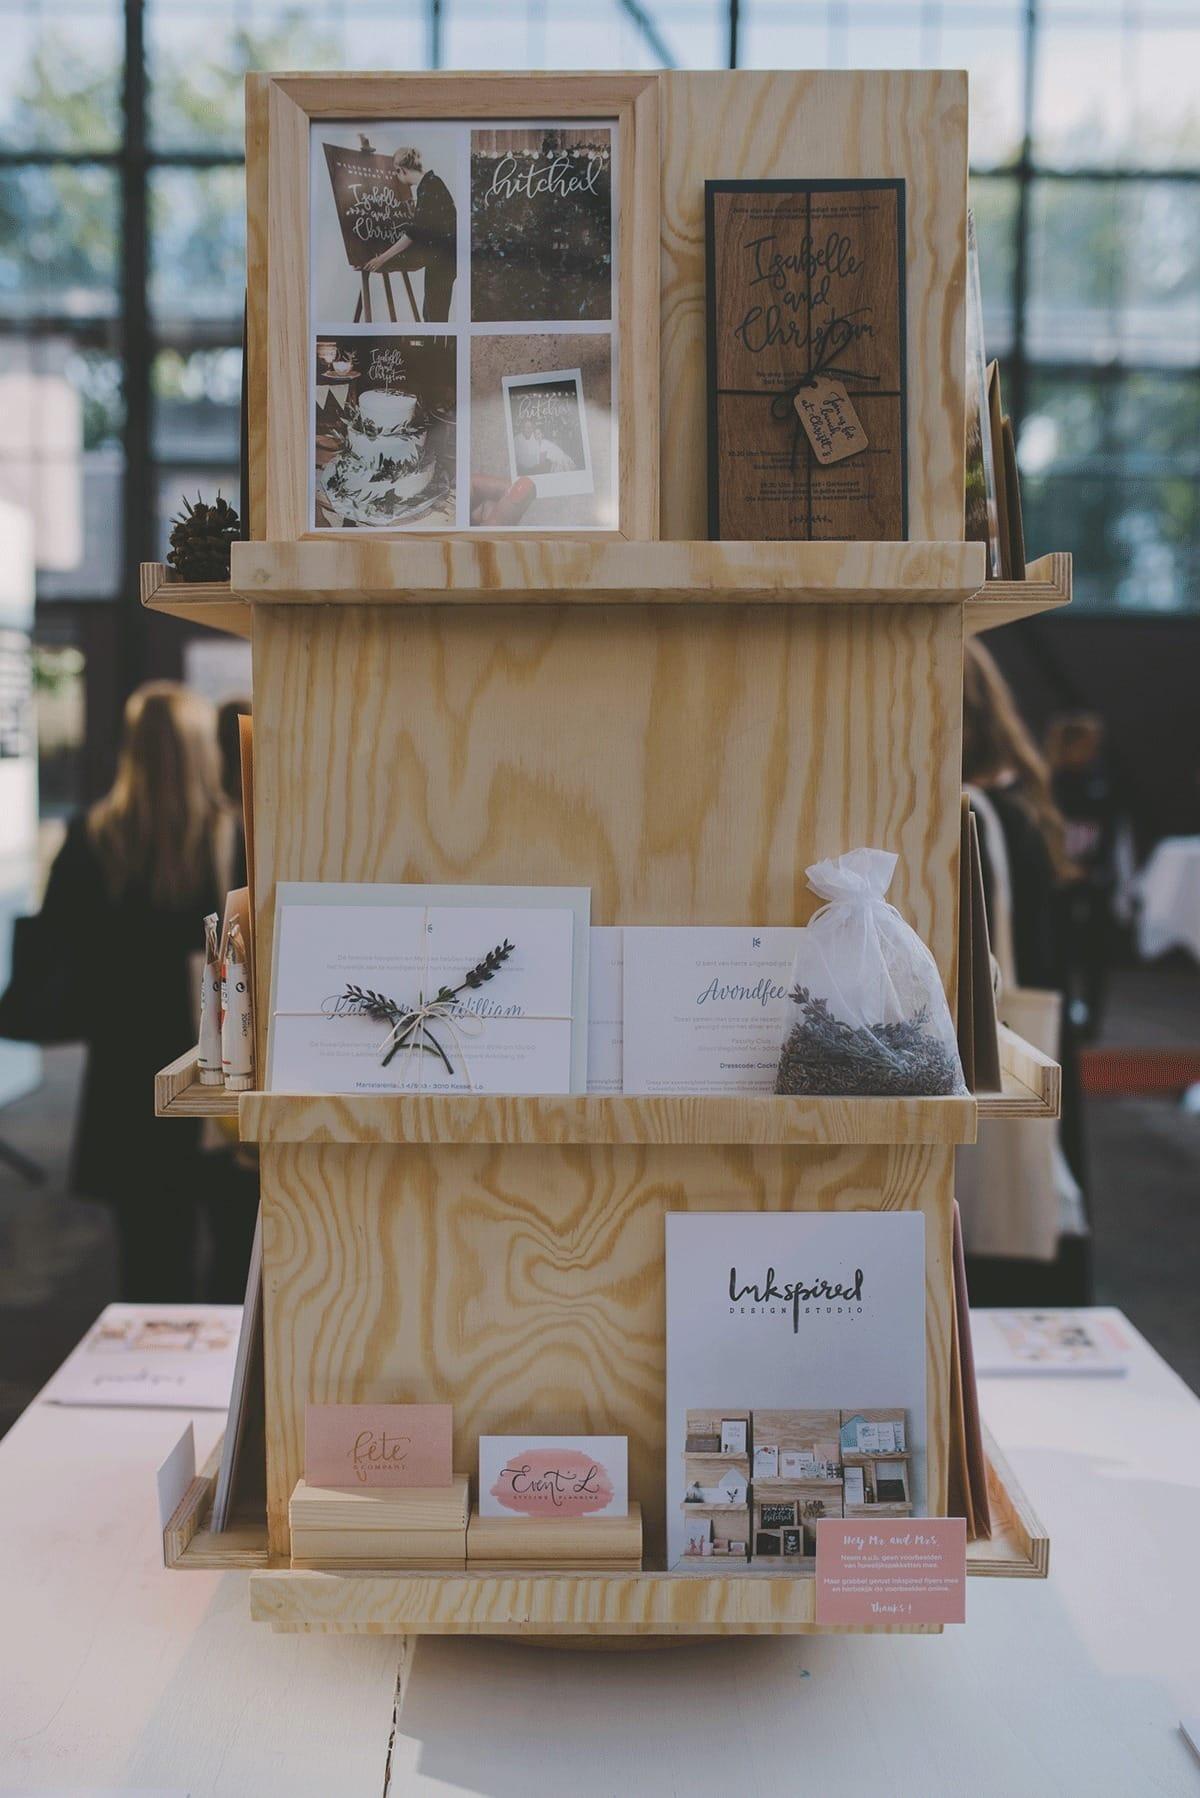 inkspired-kalligrafie-handlettering-en-stationery-bij-engaged-18